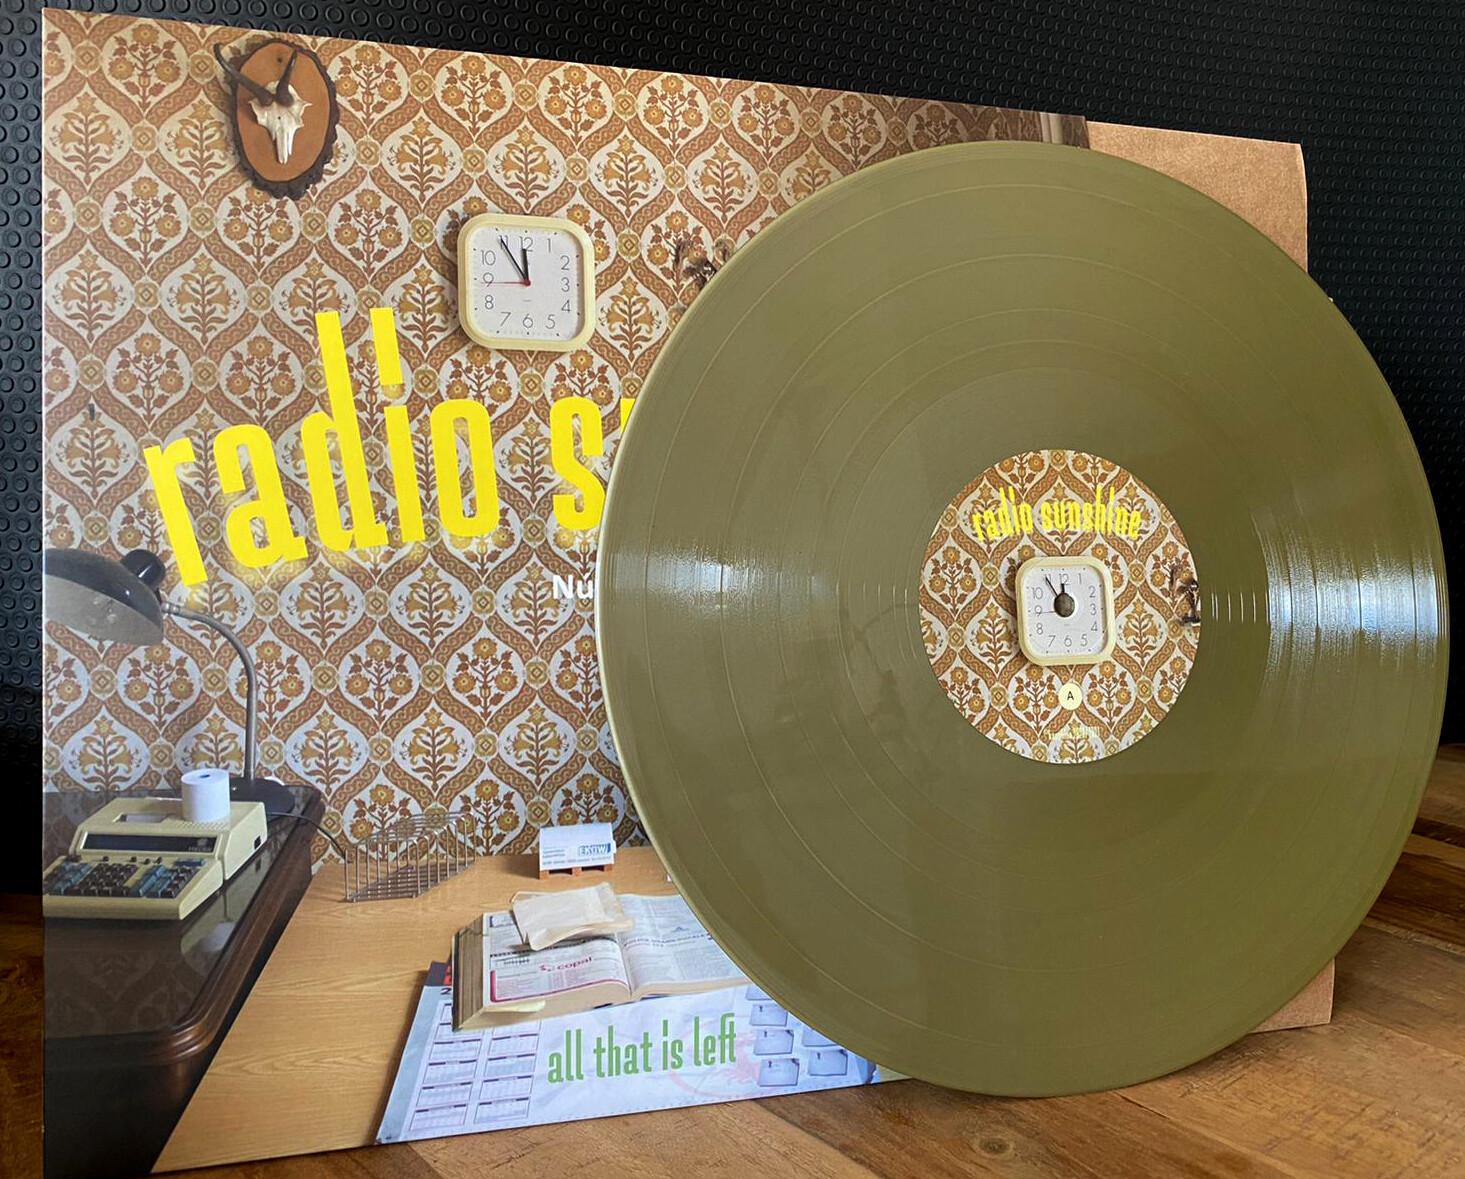 Radio Sunshine, All that is left 180gr Gold color 12